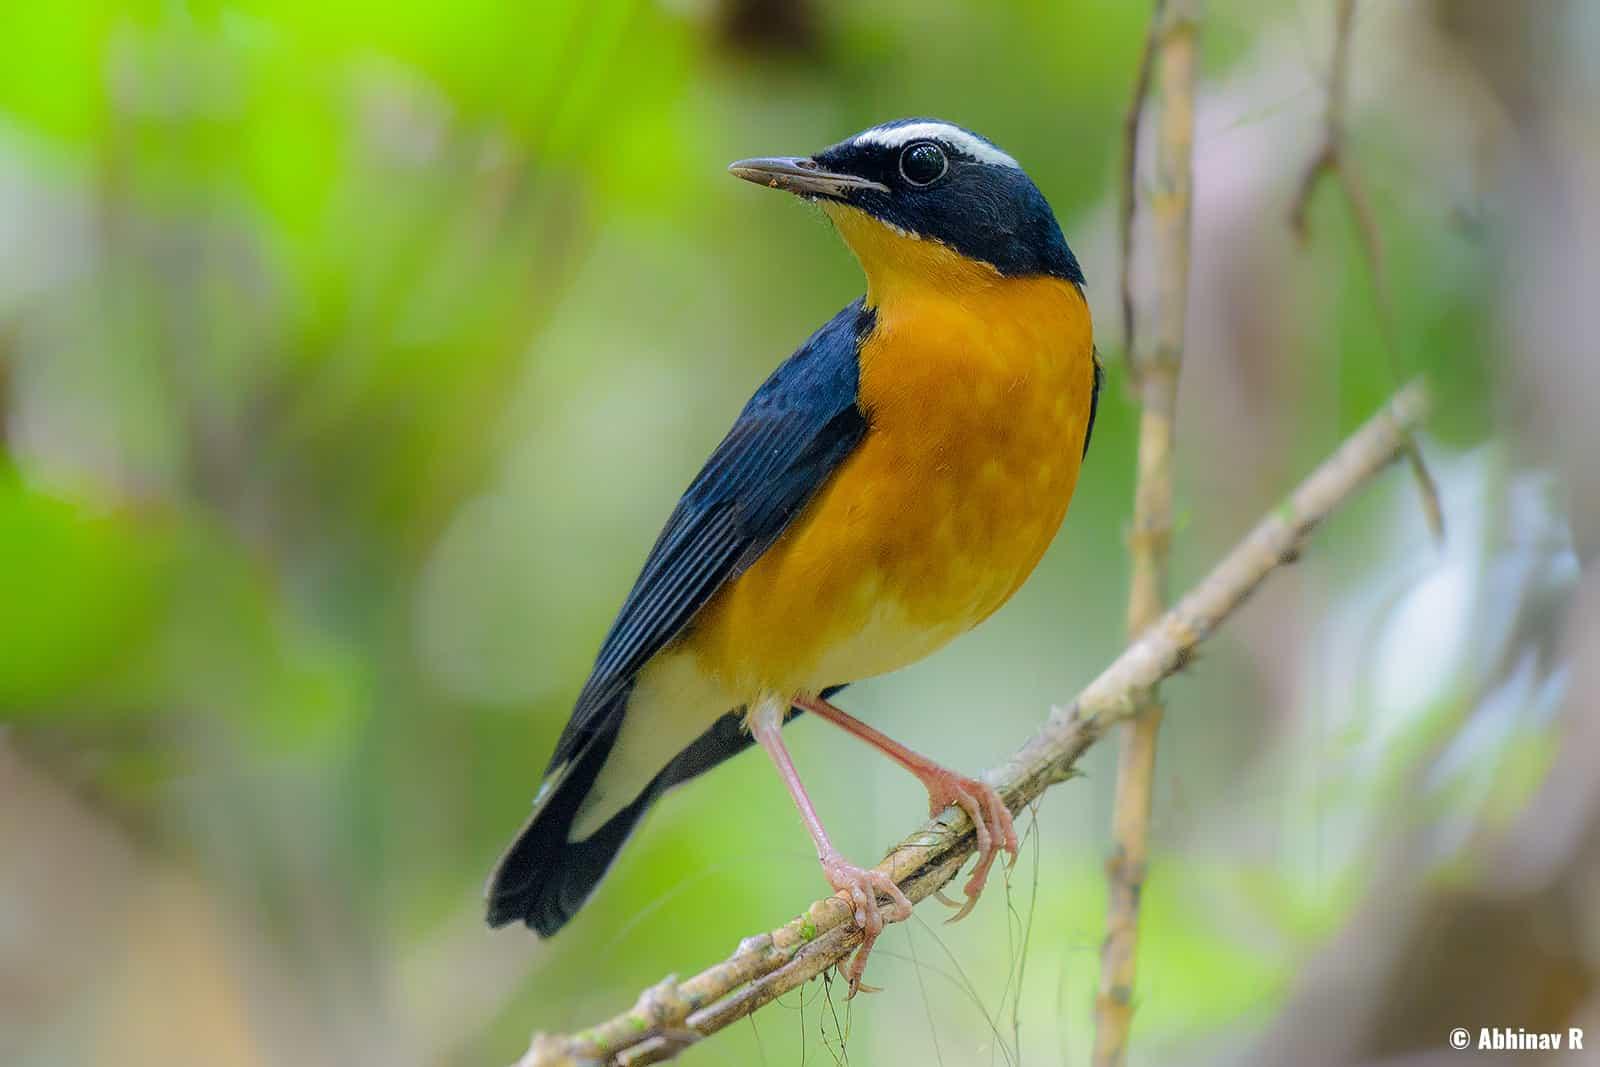 Indian Blue Robin (Larvivora brunnea) from Thattekad, Kerala